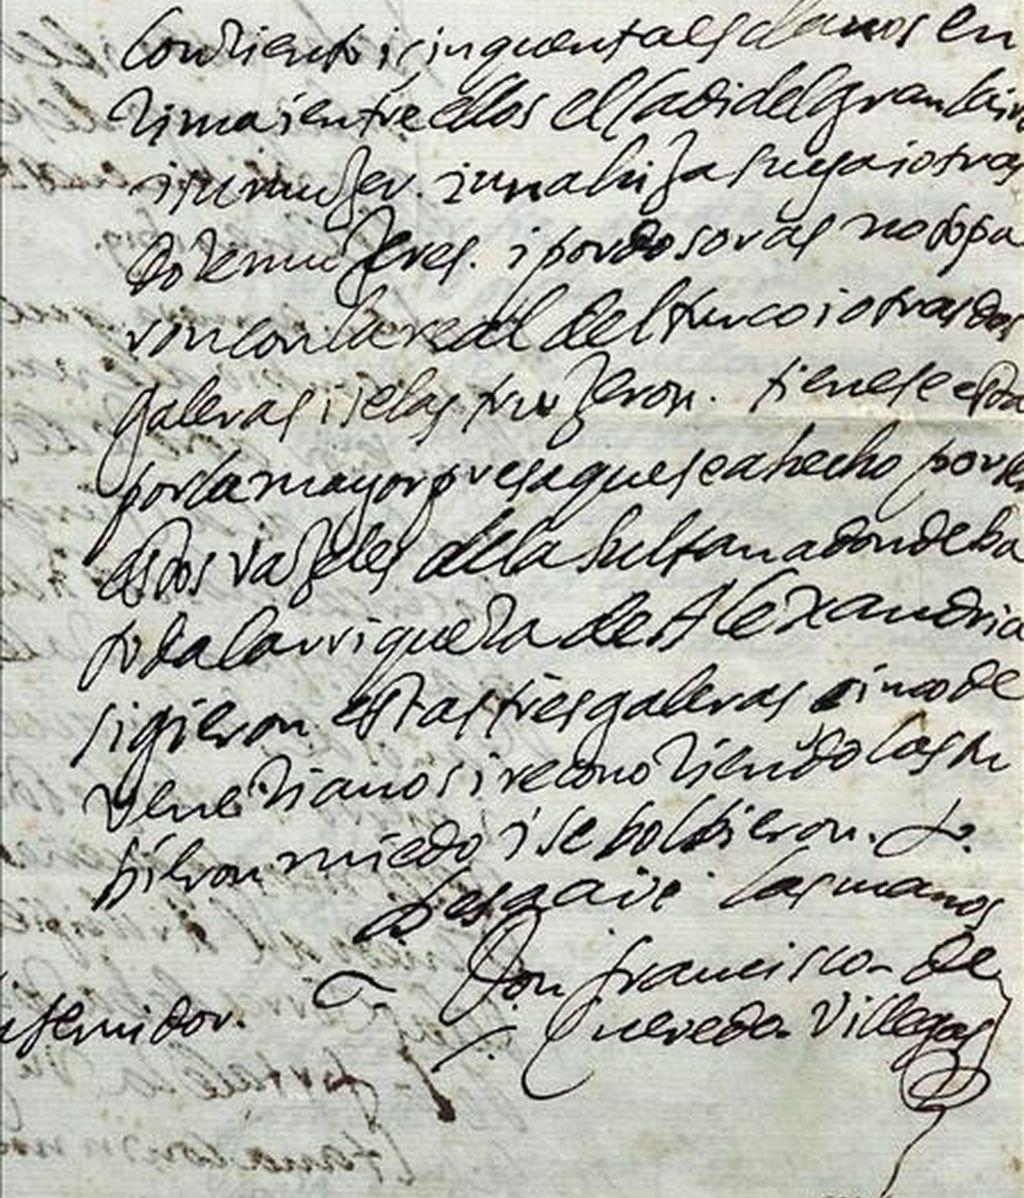 Carta autógrafa de Francisco de Quevedo y Villegas al Marqués de Caracena, fechada en 1619. EFE/Archivo